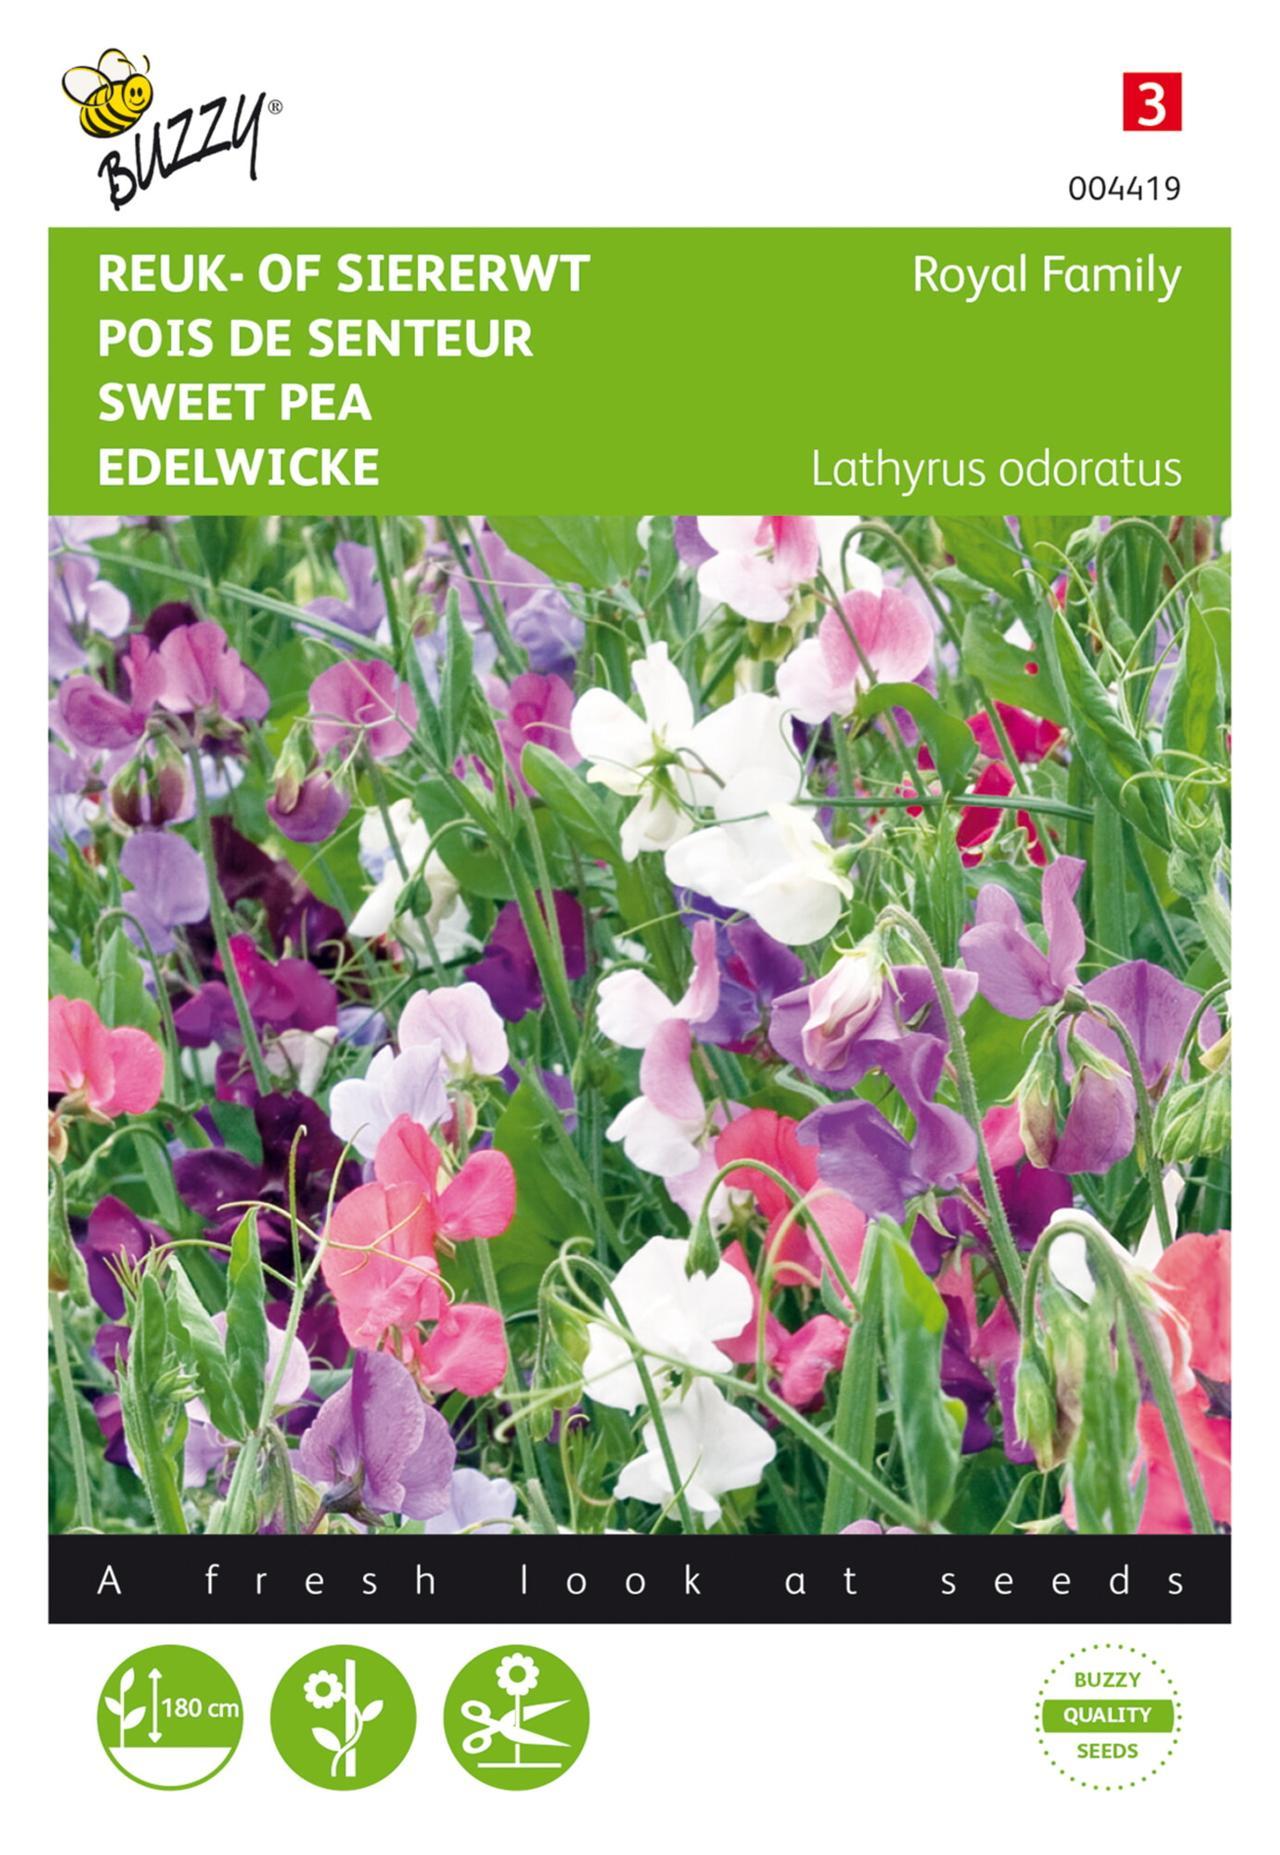 Lathyrus odoratus 'Royal Family gemengd' plant